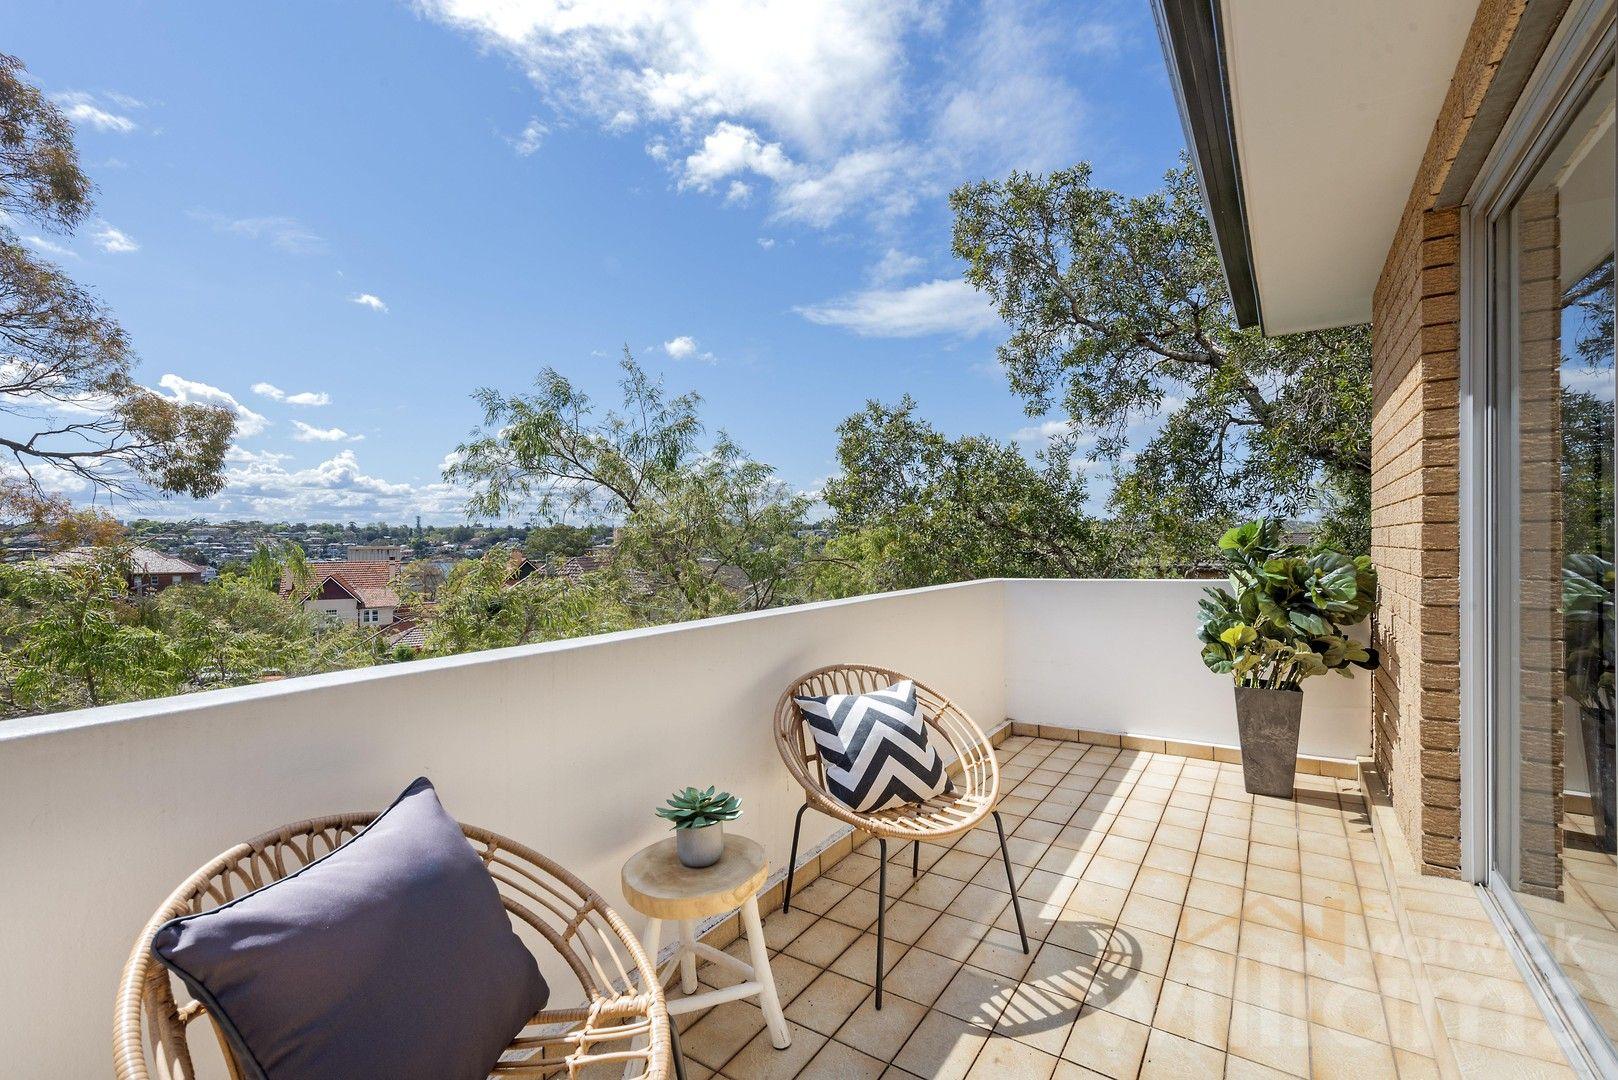 3 bedrooms Apartment / Unit / Flat in 5/27 Collingwood Street DRUMMOYNE NSW, 2047